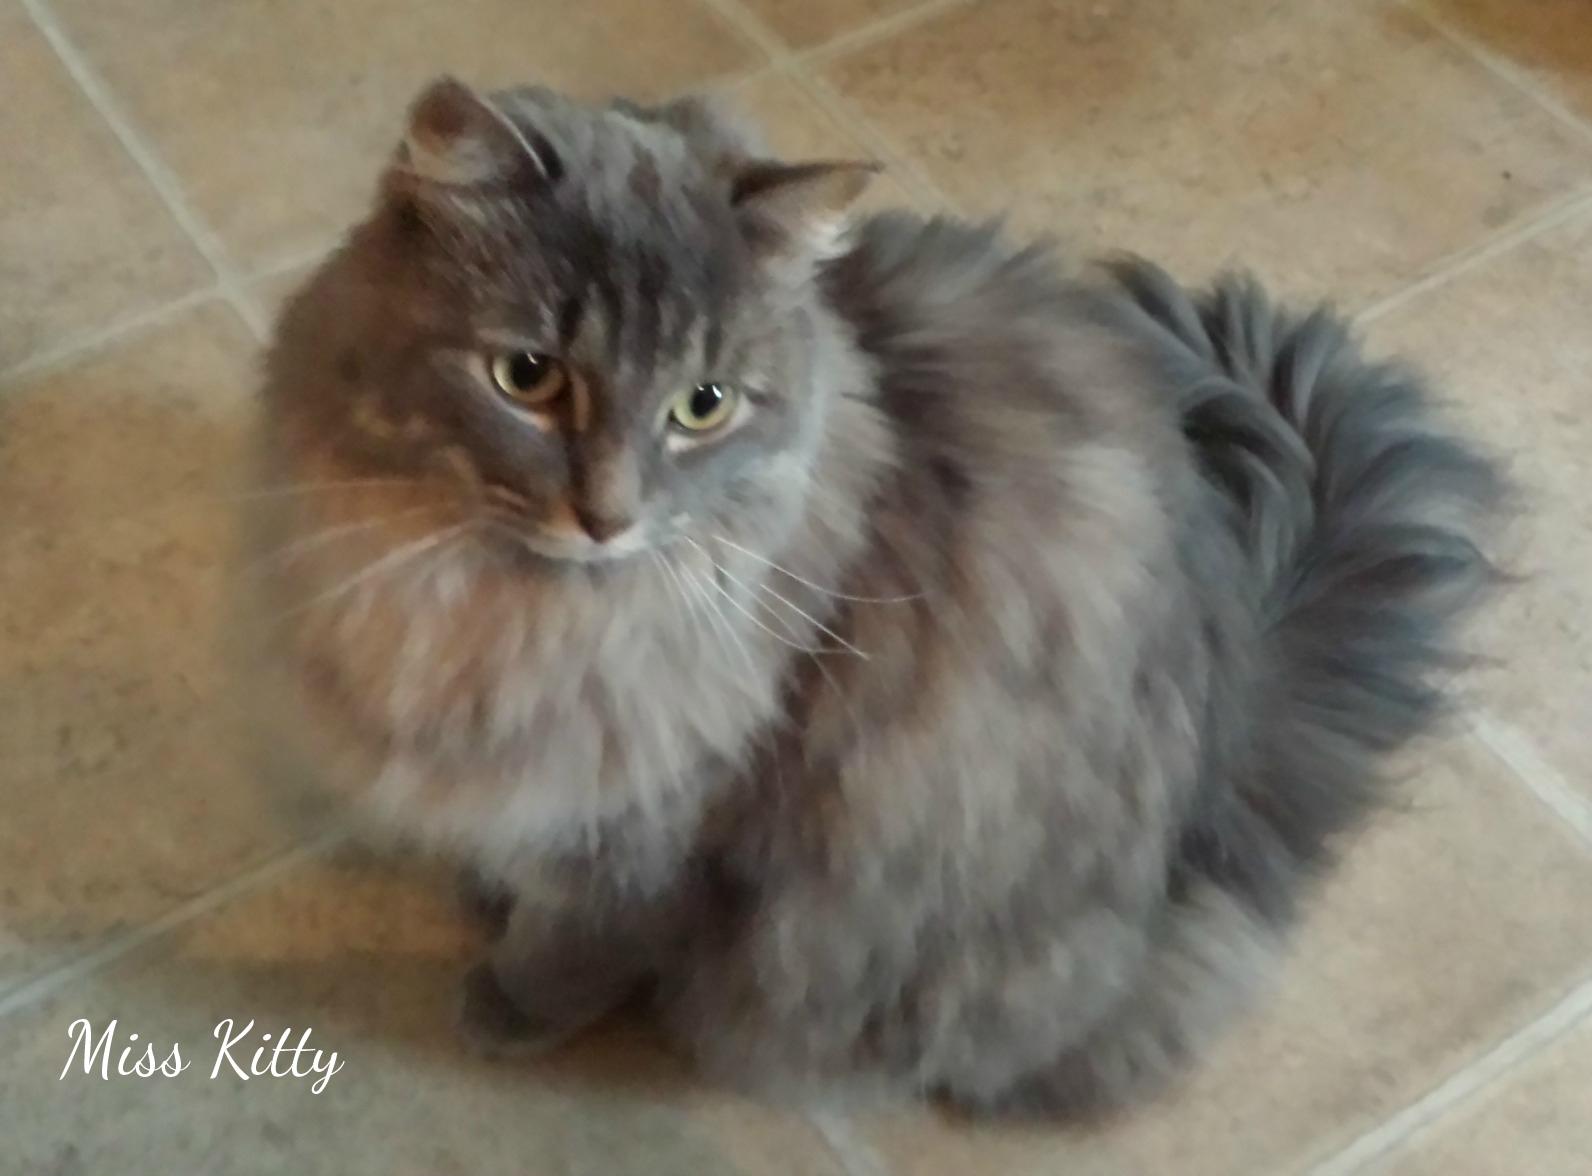 Ms-Kitty-edited